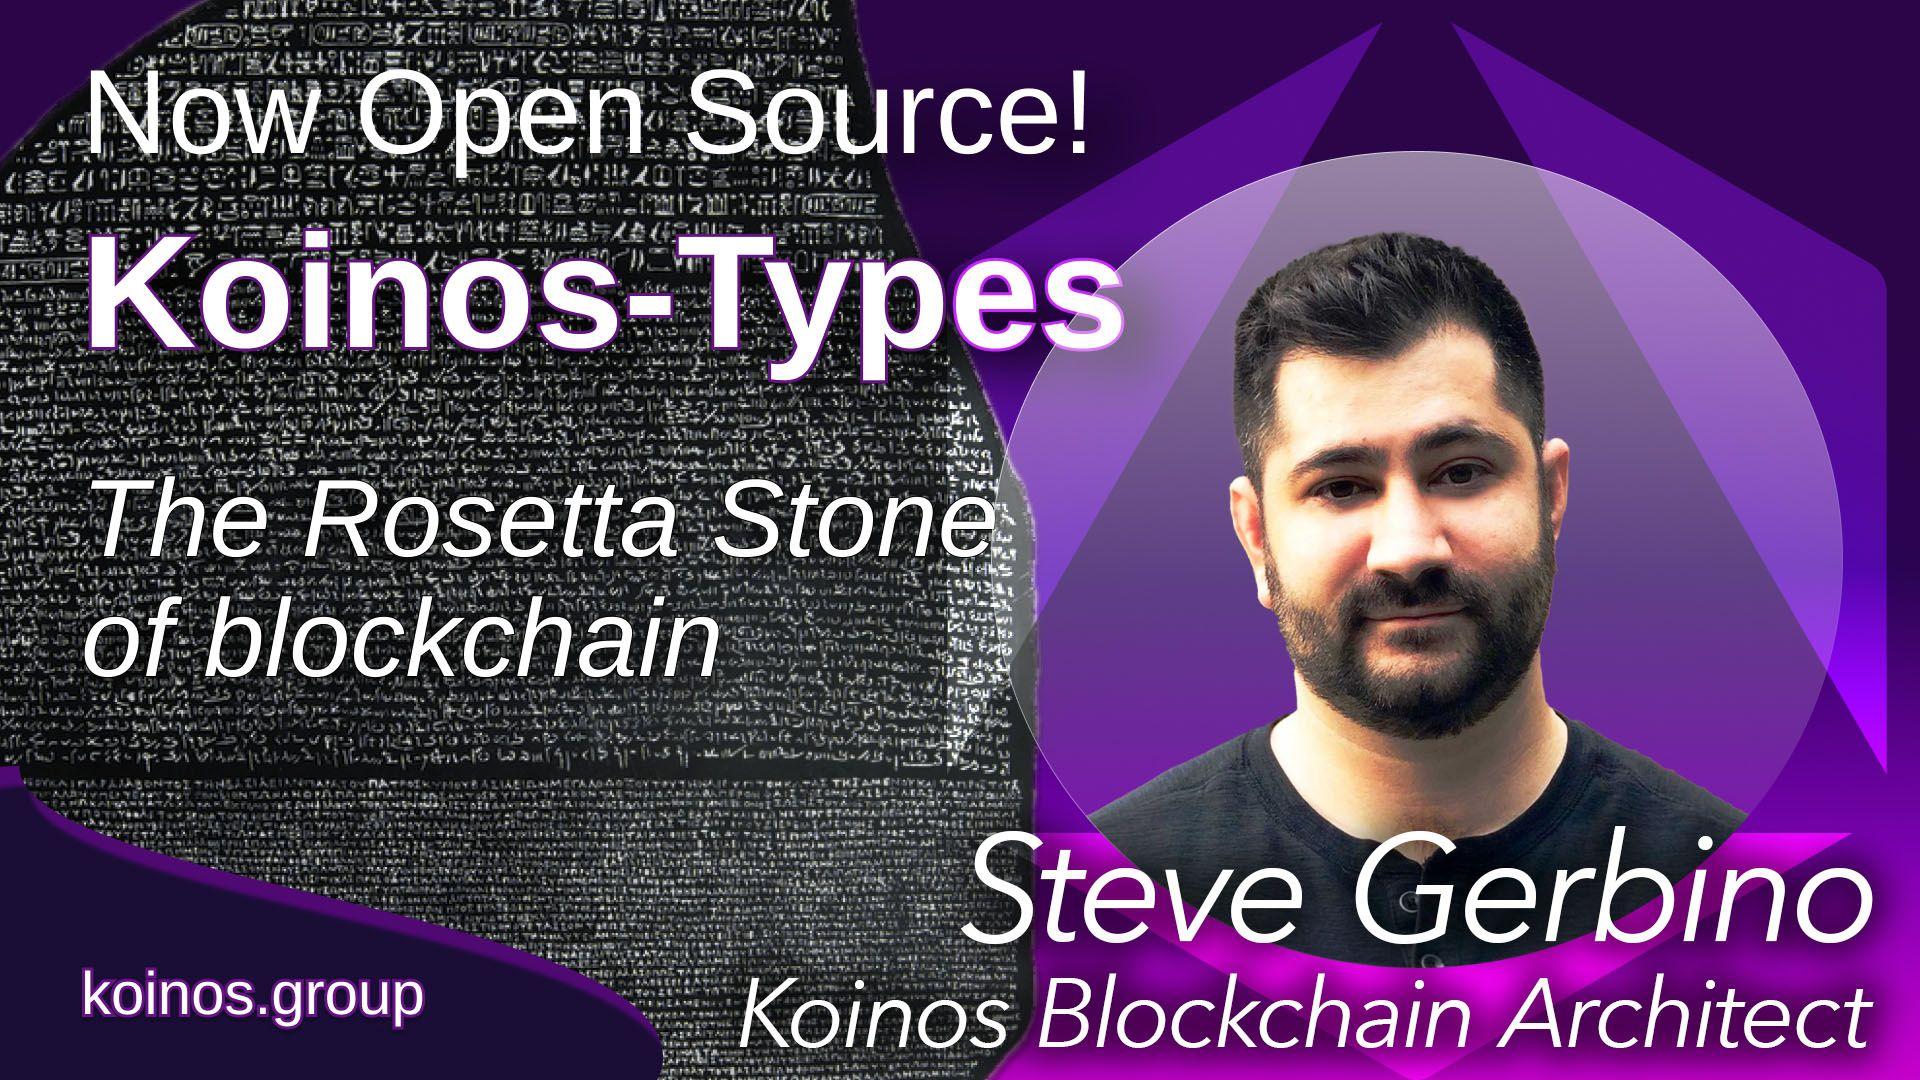 /meet-the-rosetta-stone-of-blockchain-0b1033zj feature image